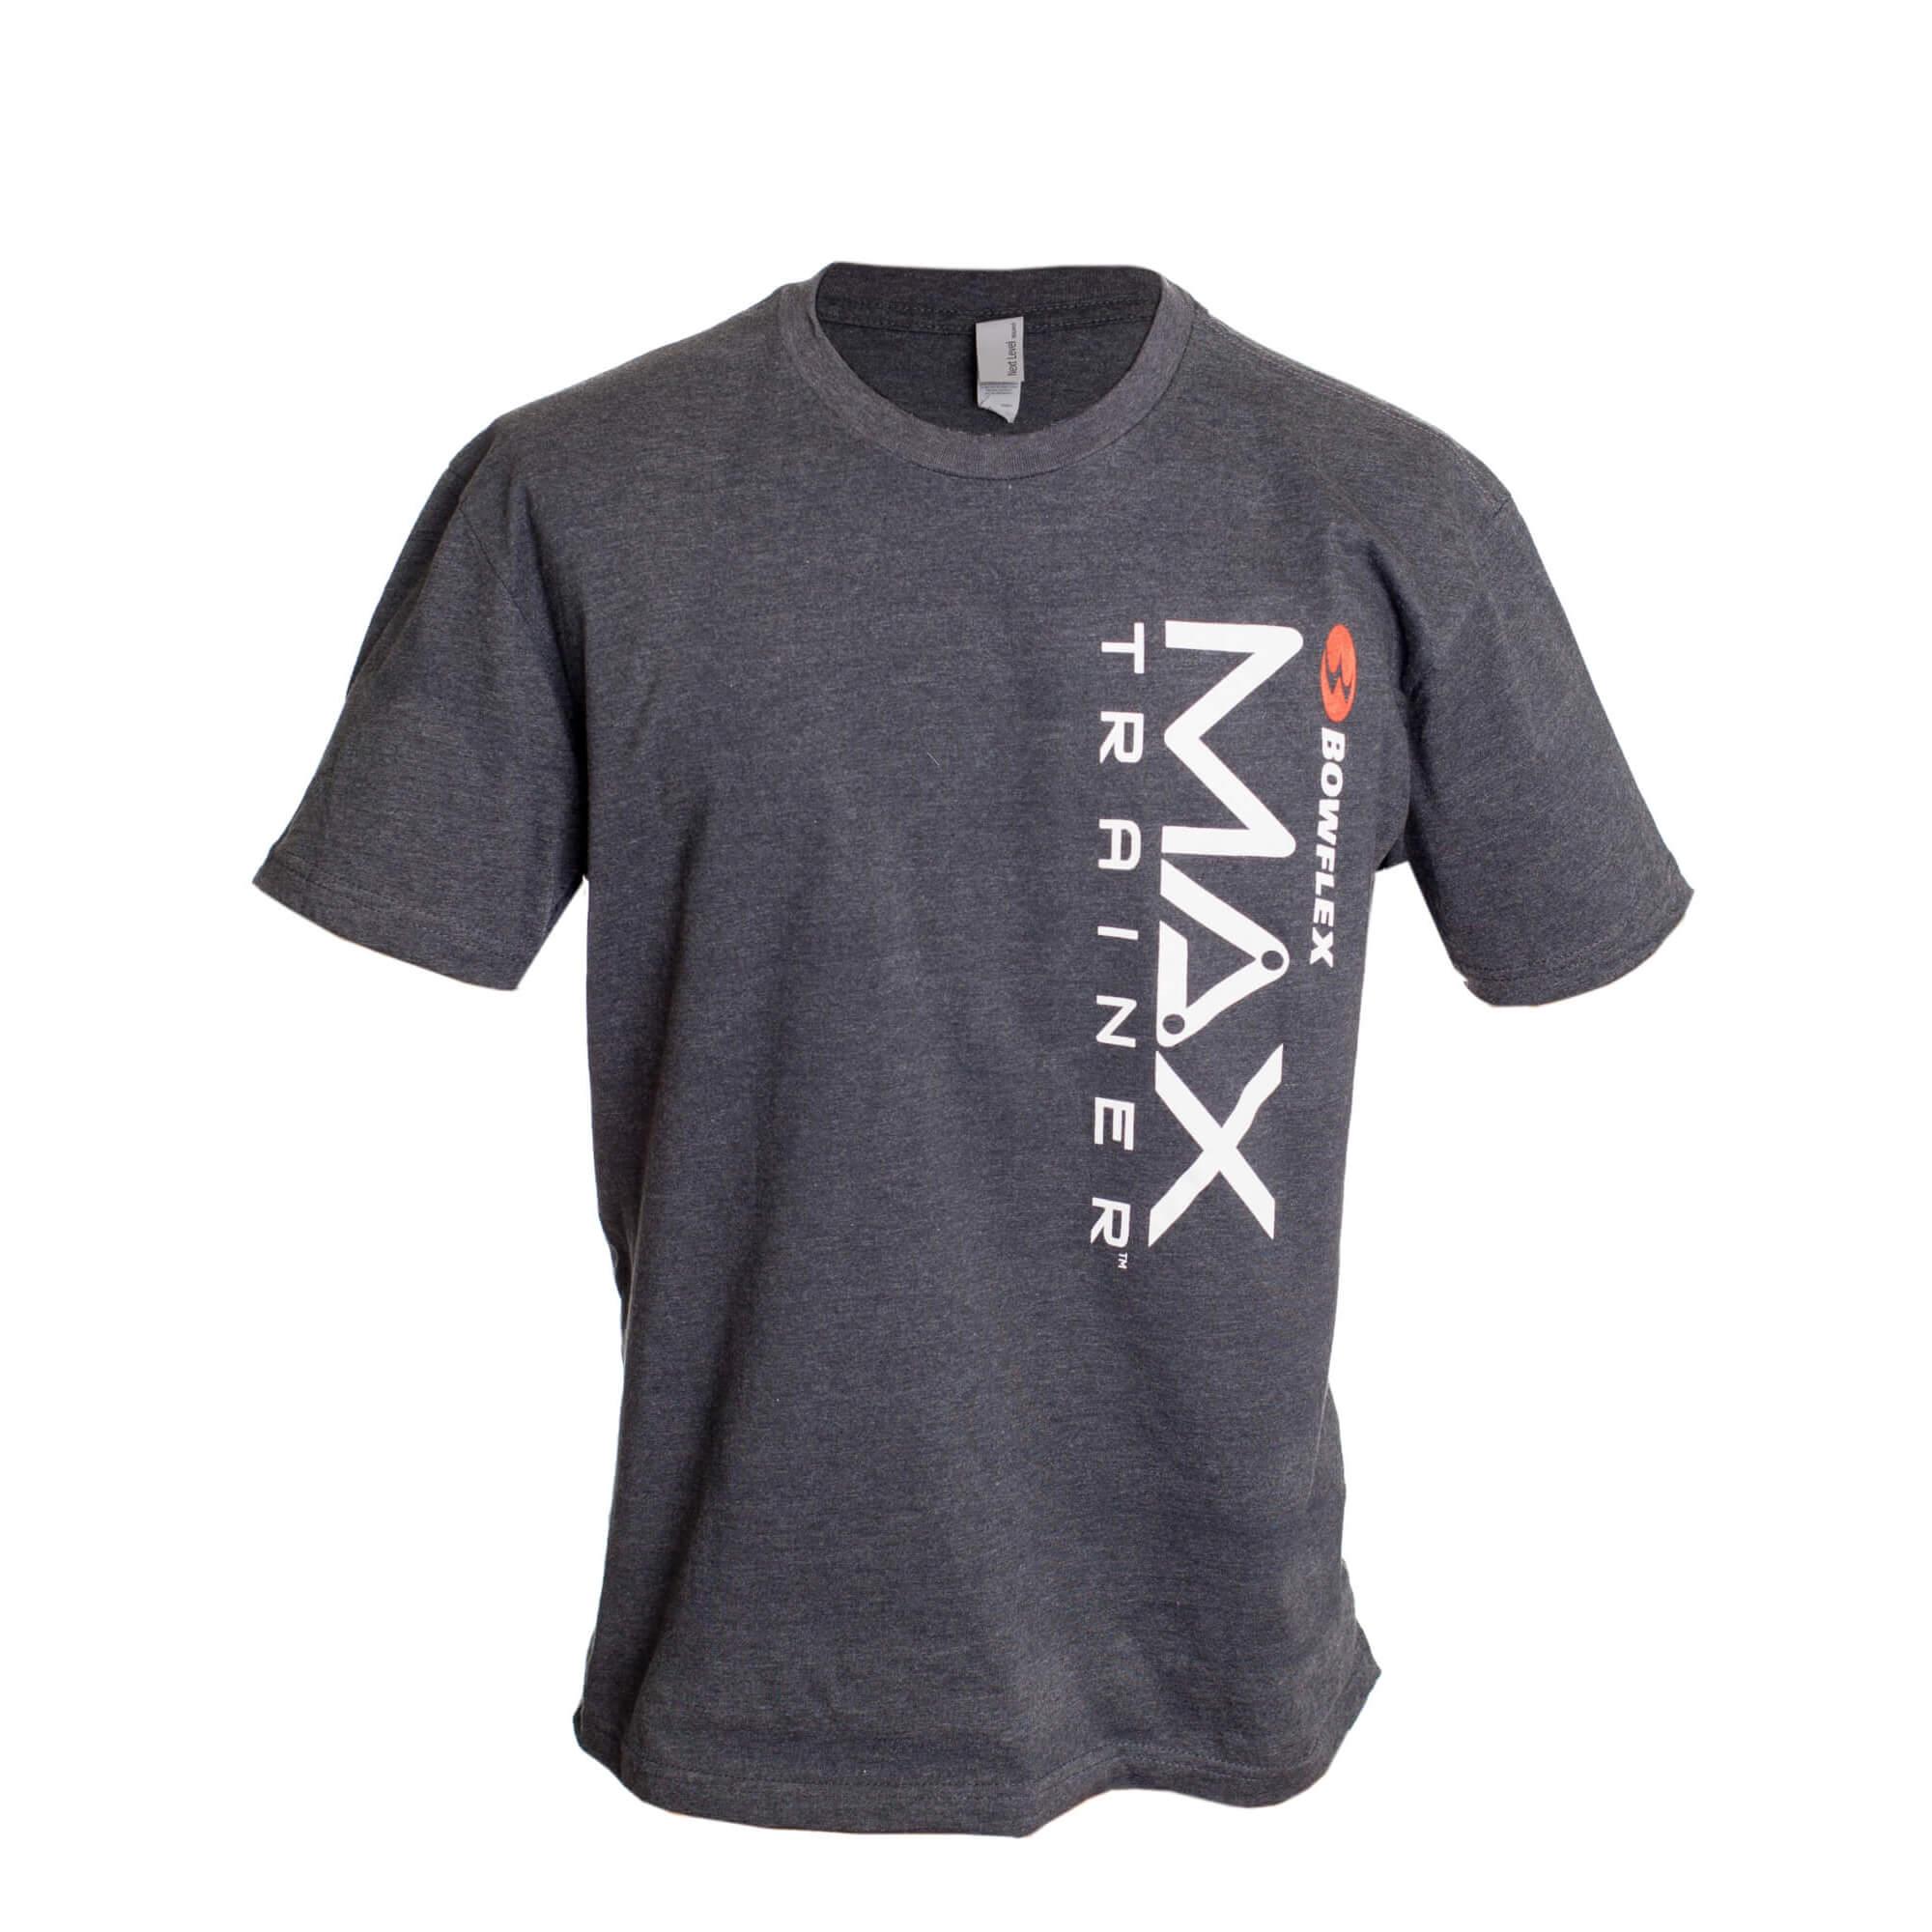 Bowflex Max Reviews >> Bowflex Max Trainer Men's T-Shirt | Bowflex